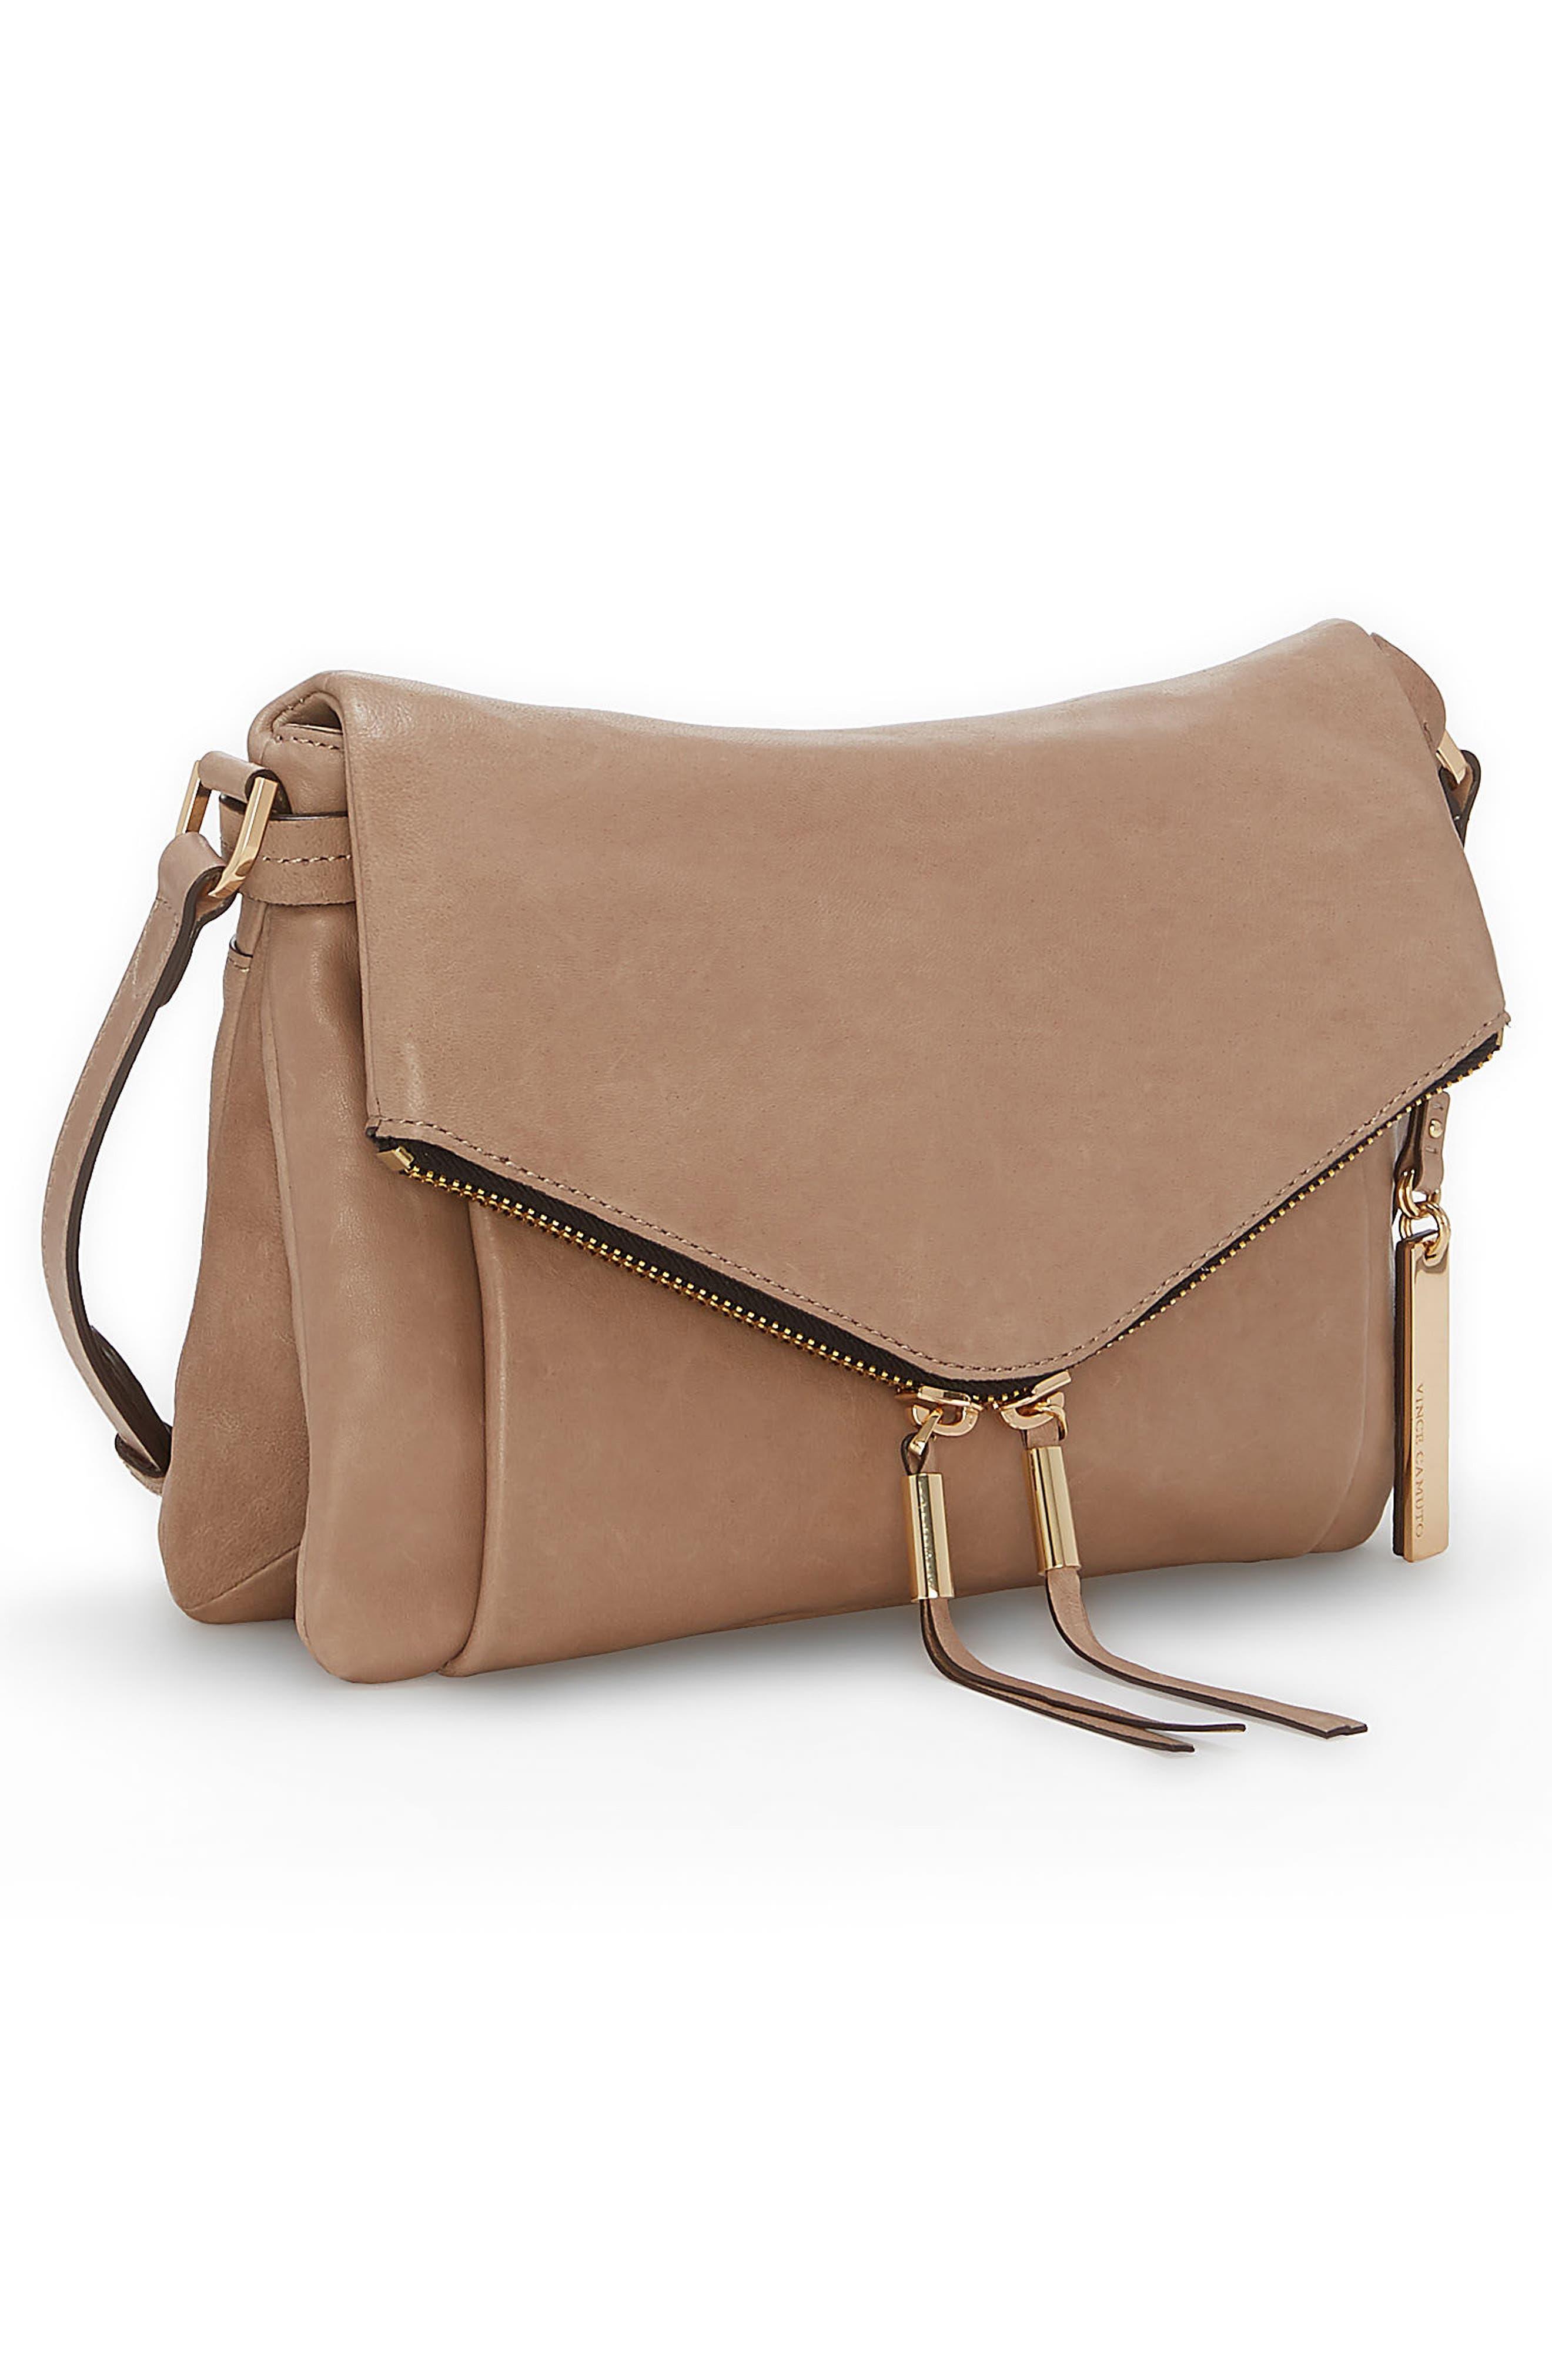 Alder Leather Crossbody Bag,                             Alternate thumbnail 12, color,